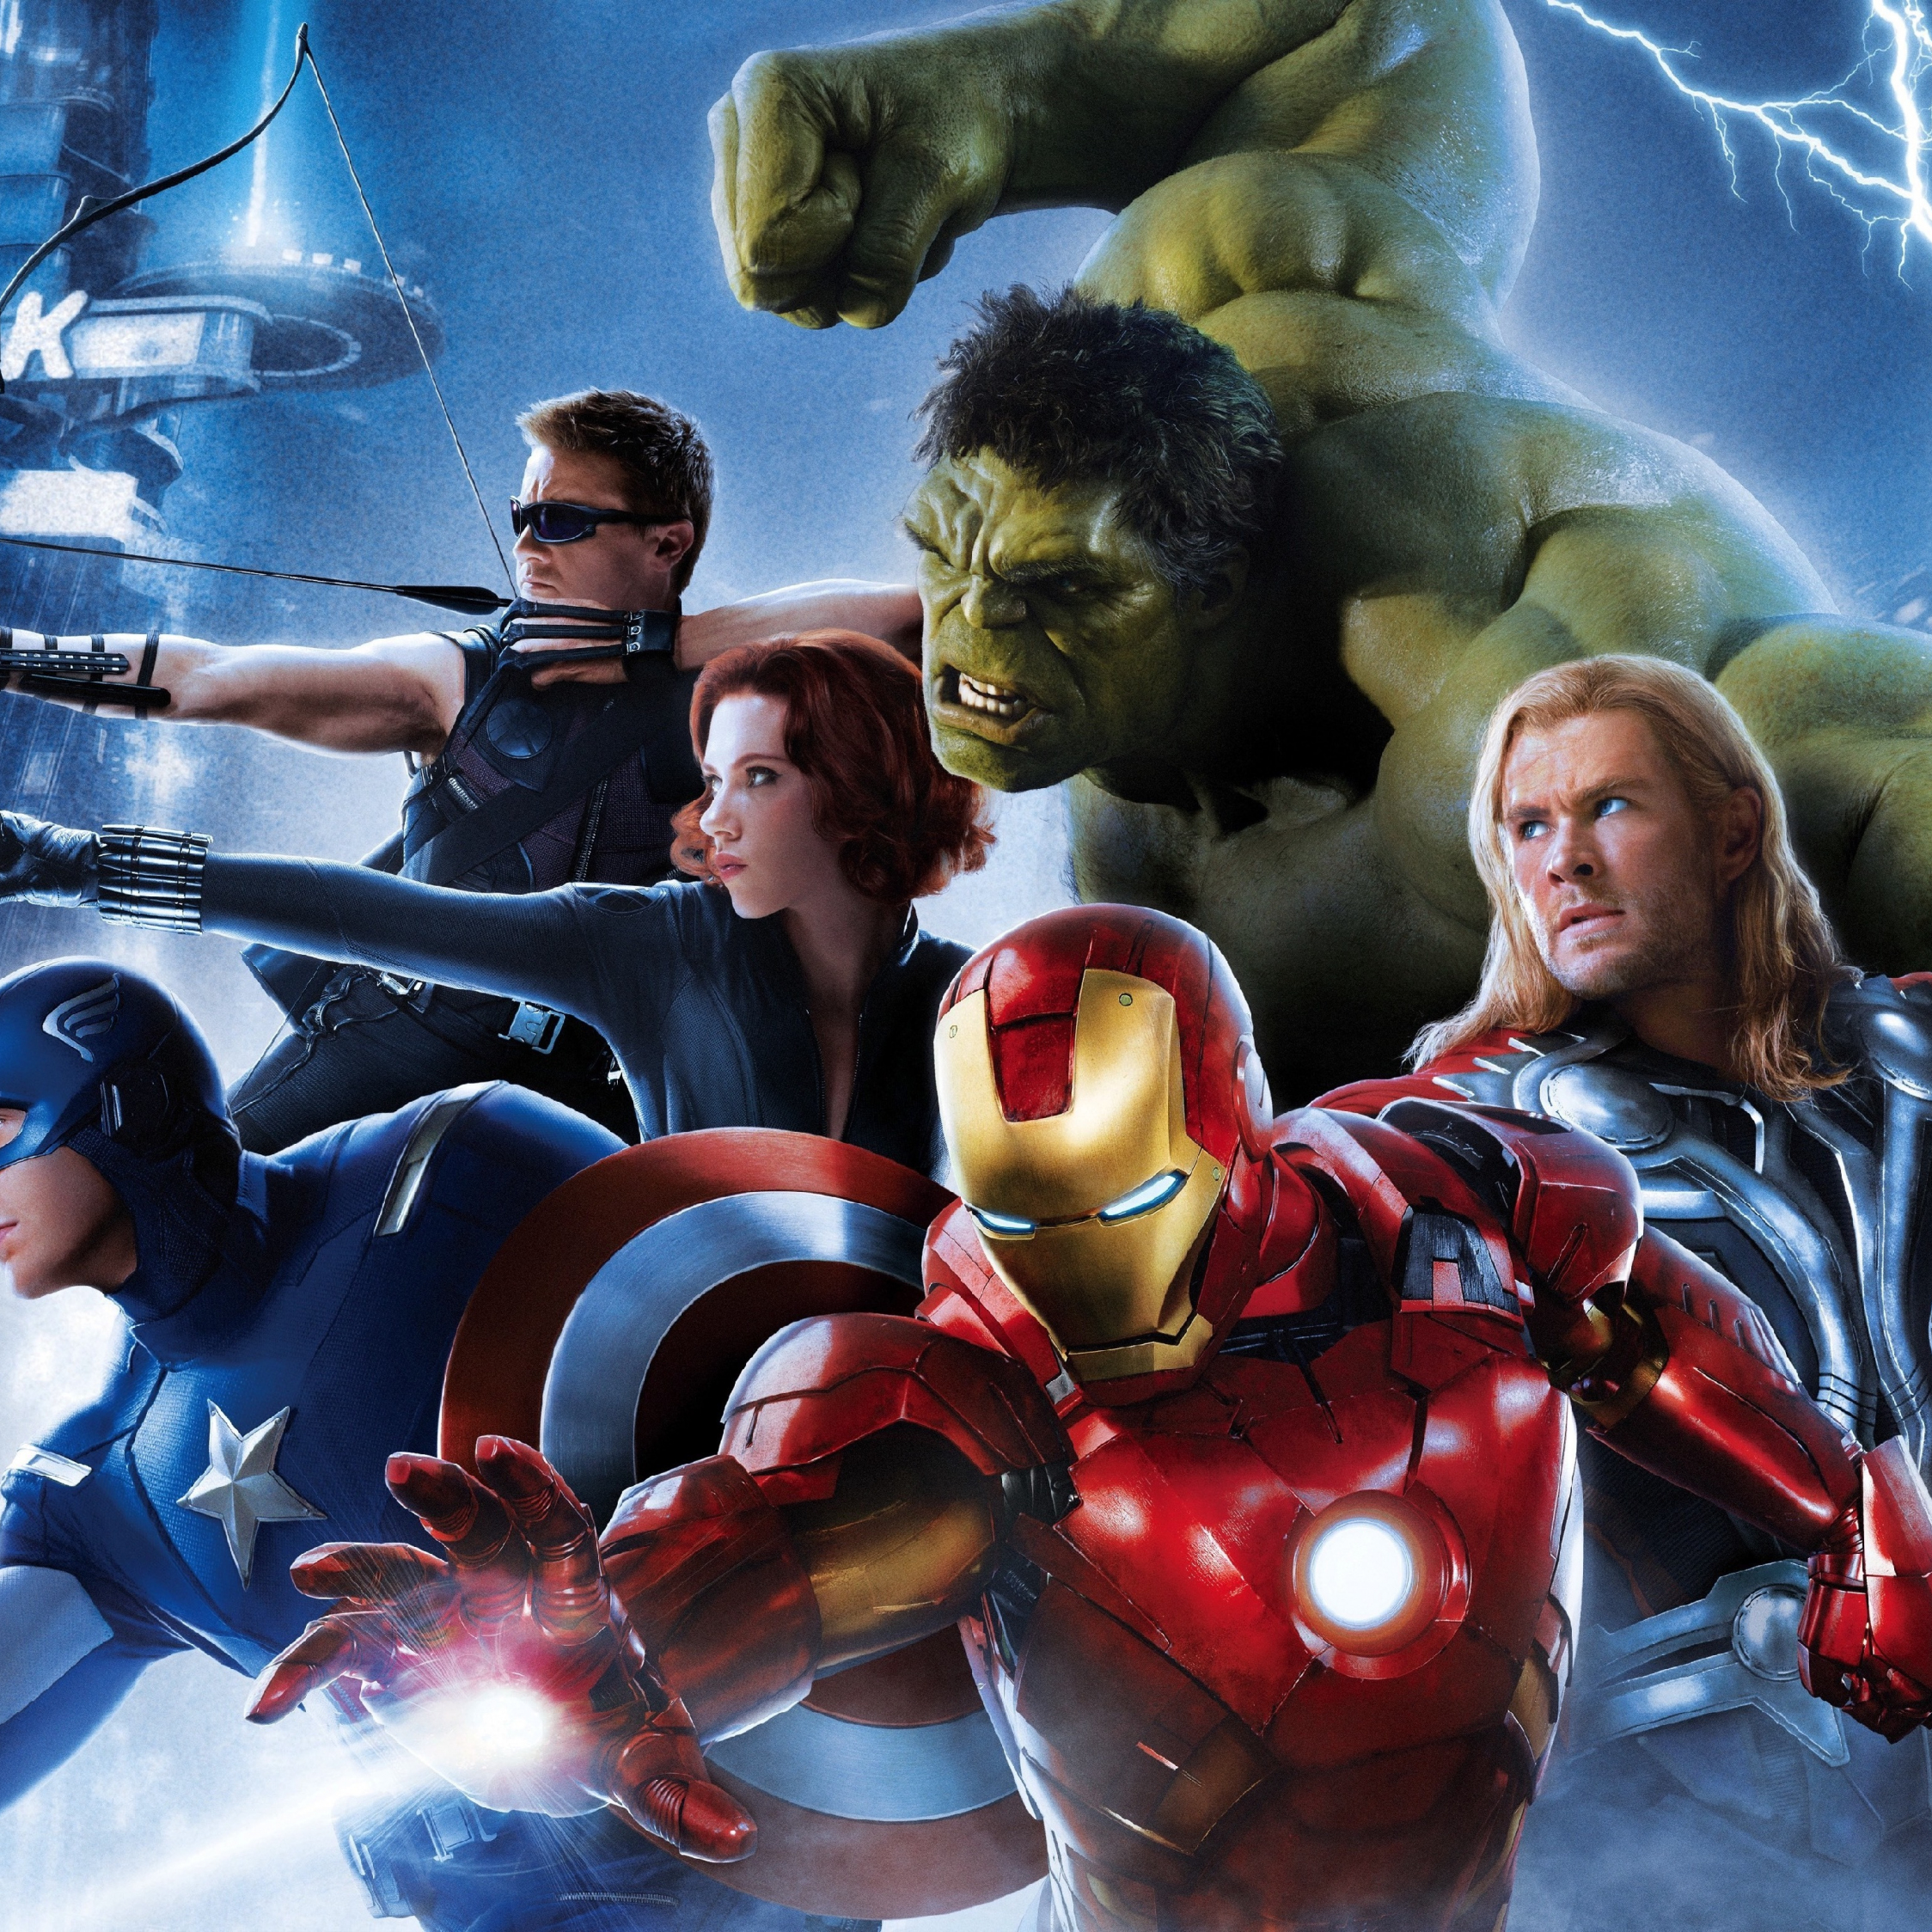 Download 2248x2248 Wallpaper Iron Man Thor Captain America